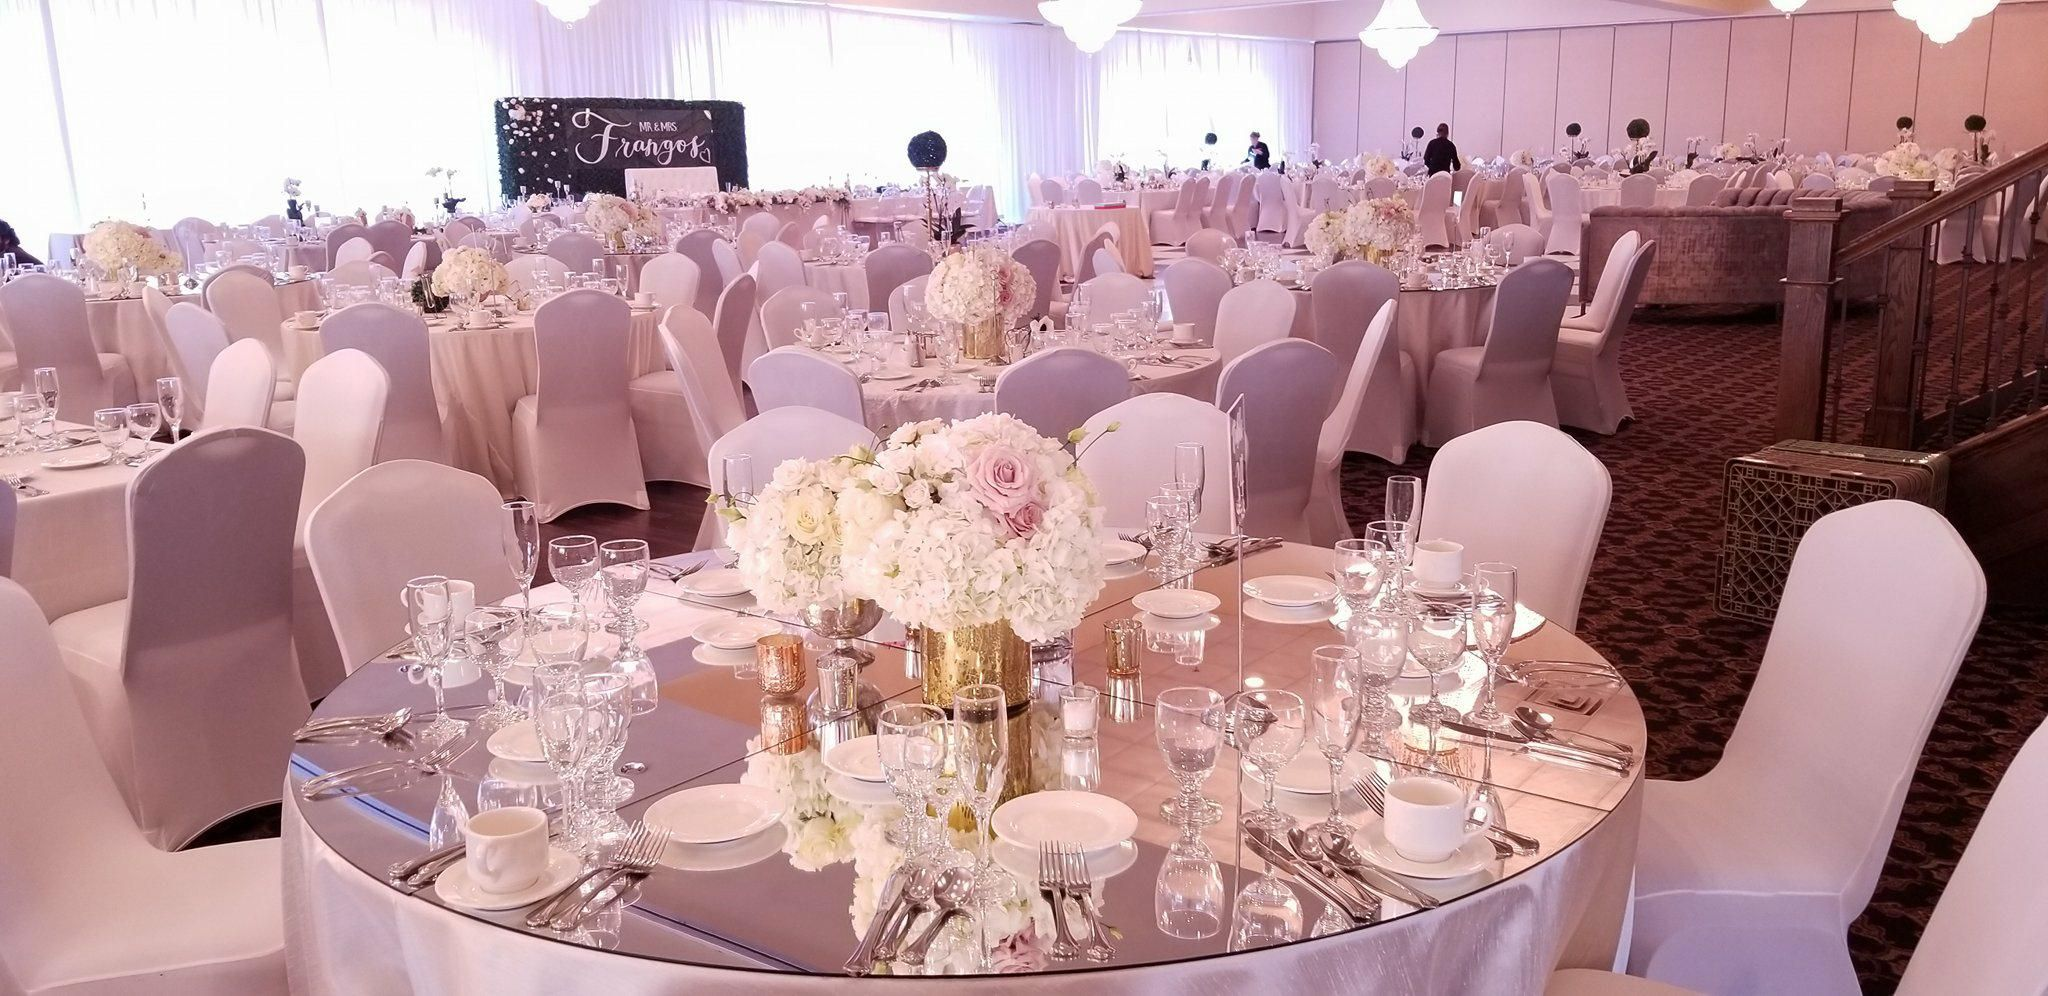 Simply fabulous! Avalon Manor Ballroom in Merrillville, IN. Venue ...